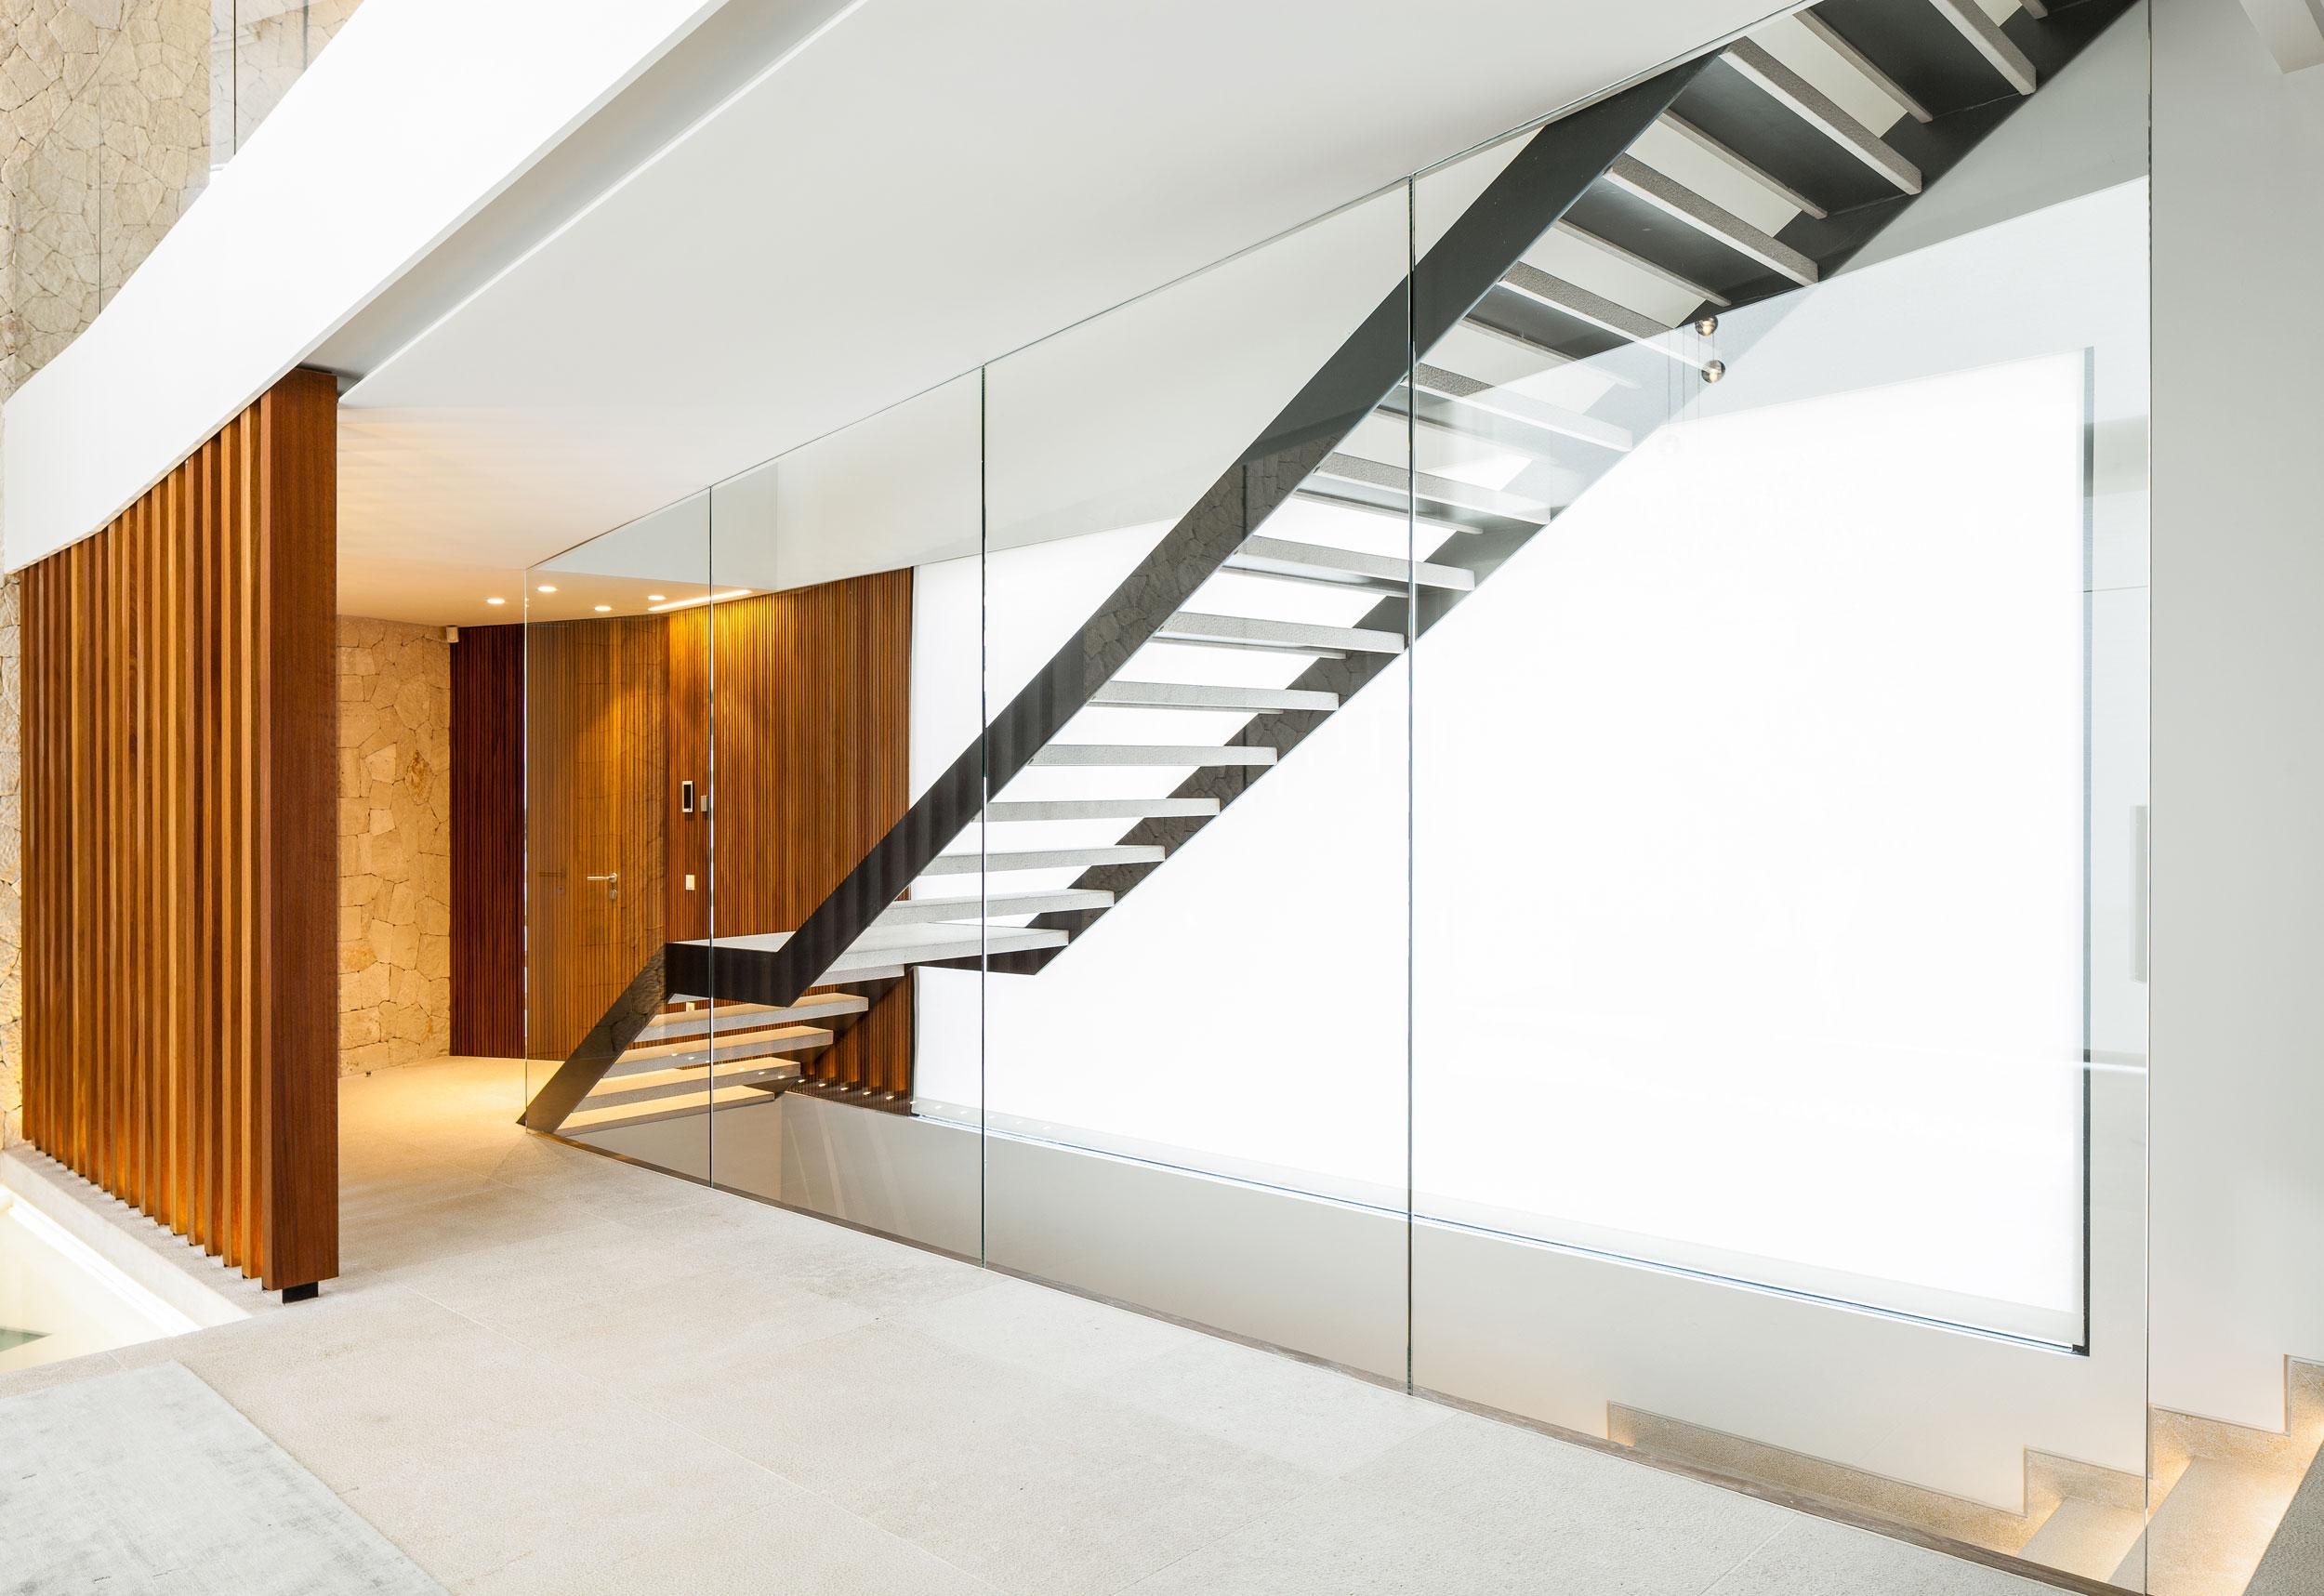 Lobby-stairs.jpg